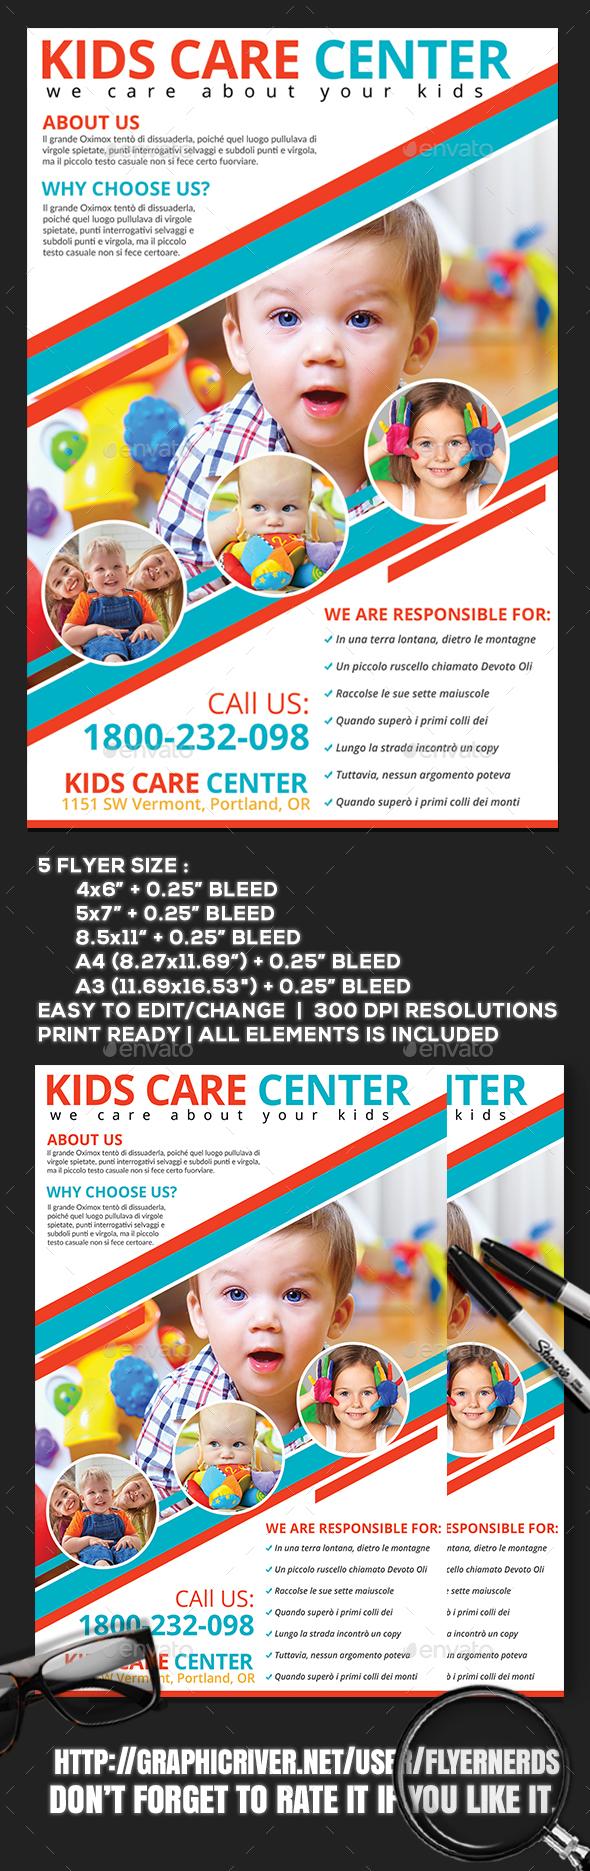 Kids Care Center Flyer - Commerce Flyers